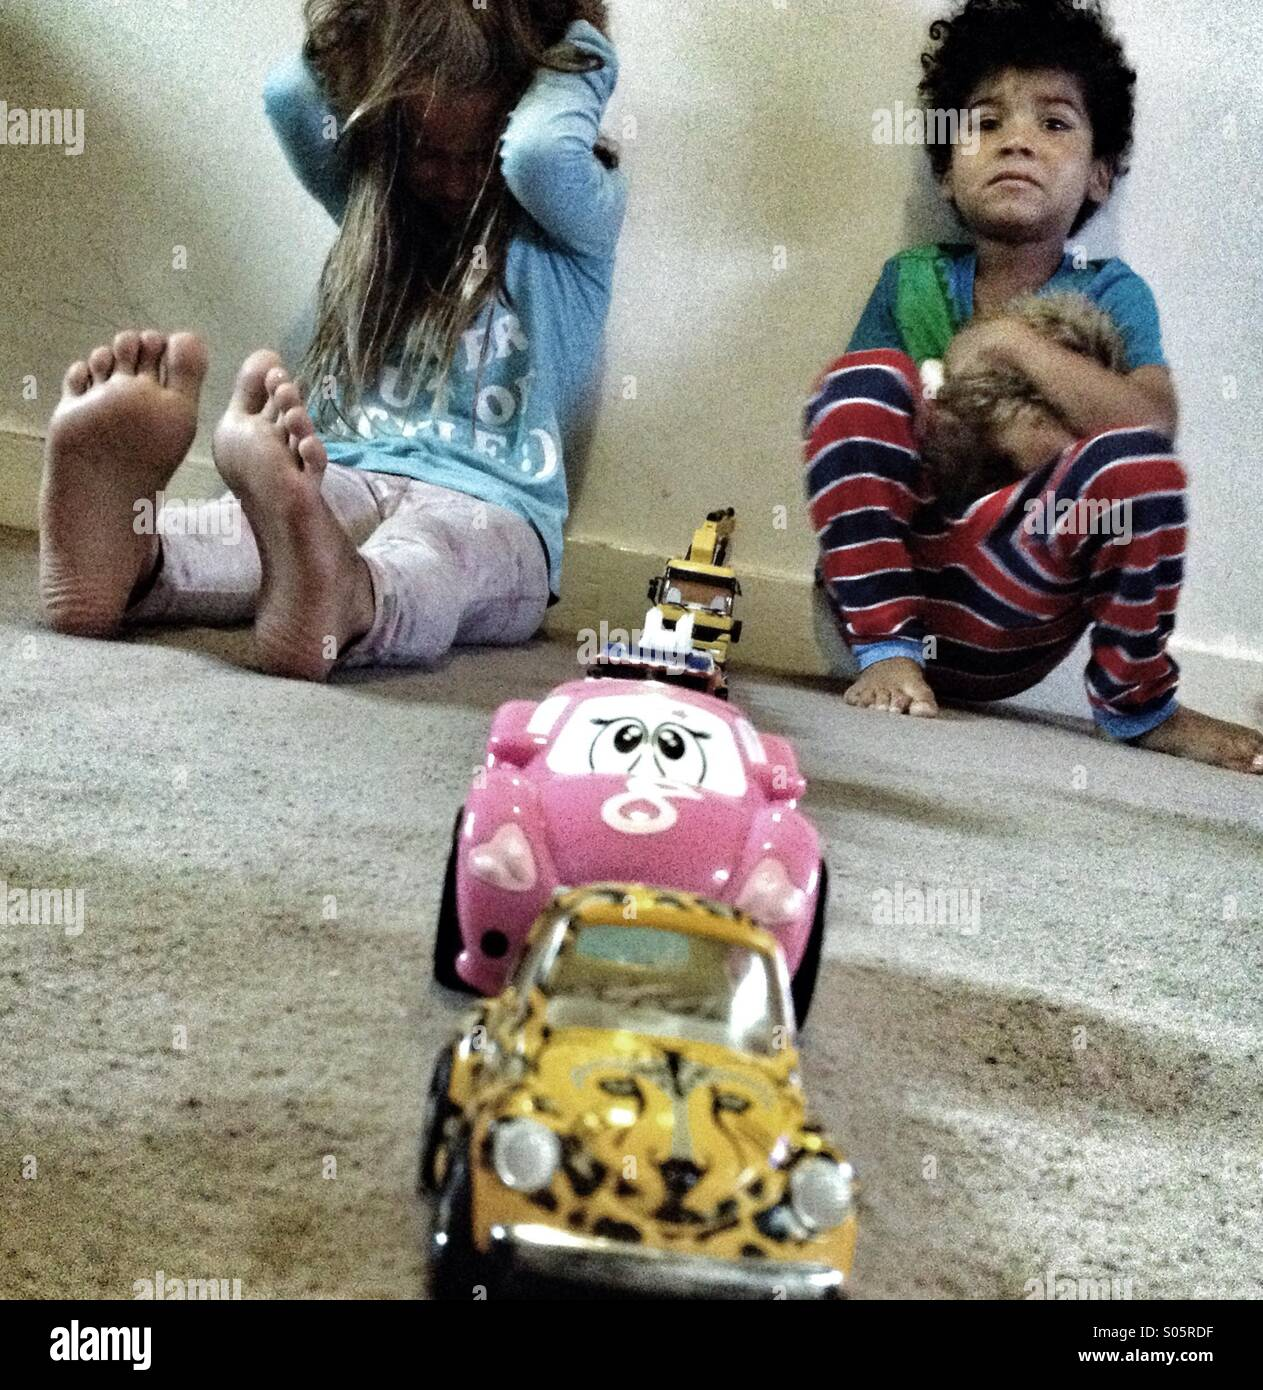 Spoiled kids - Stock Image